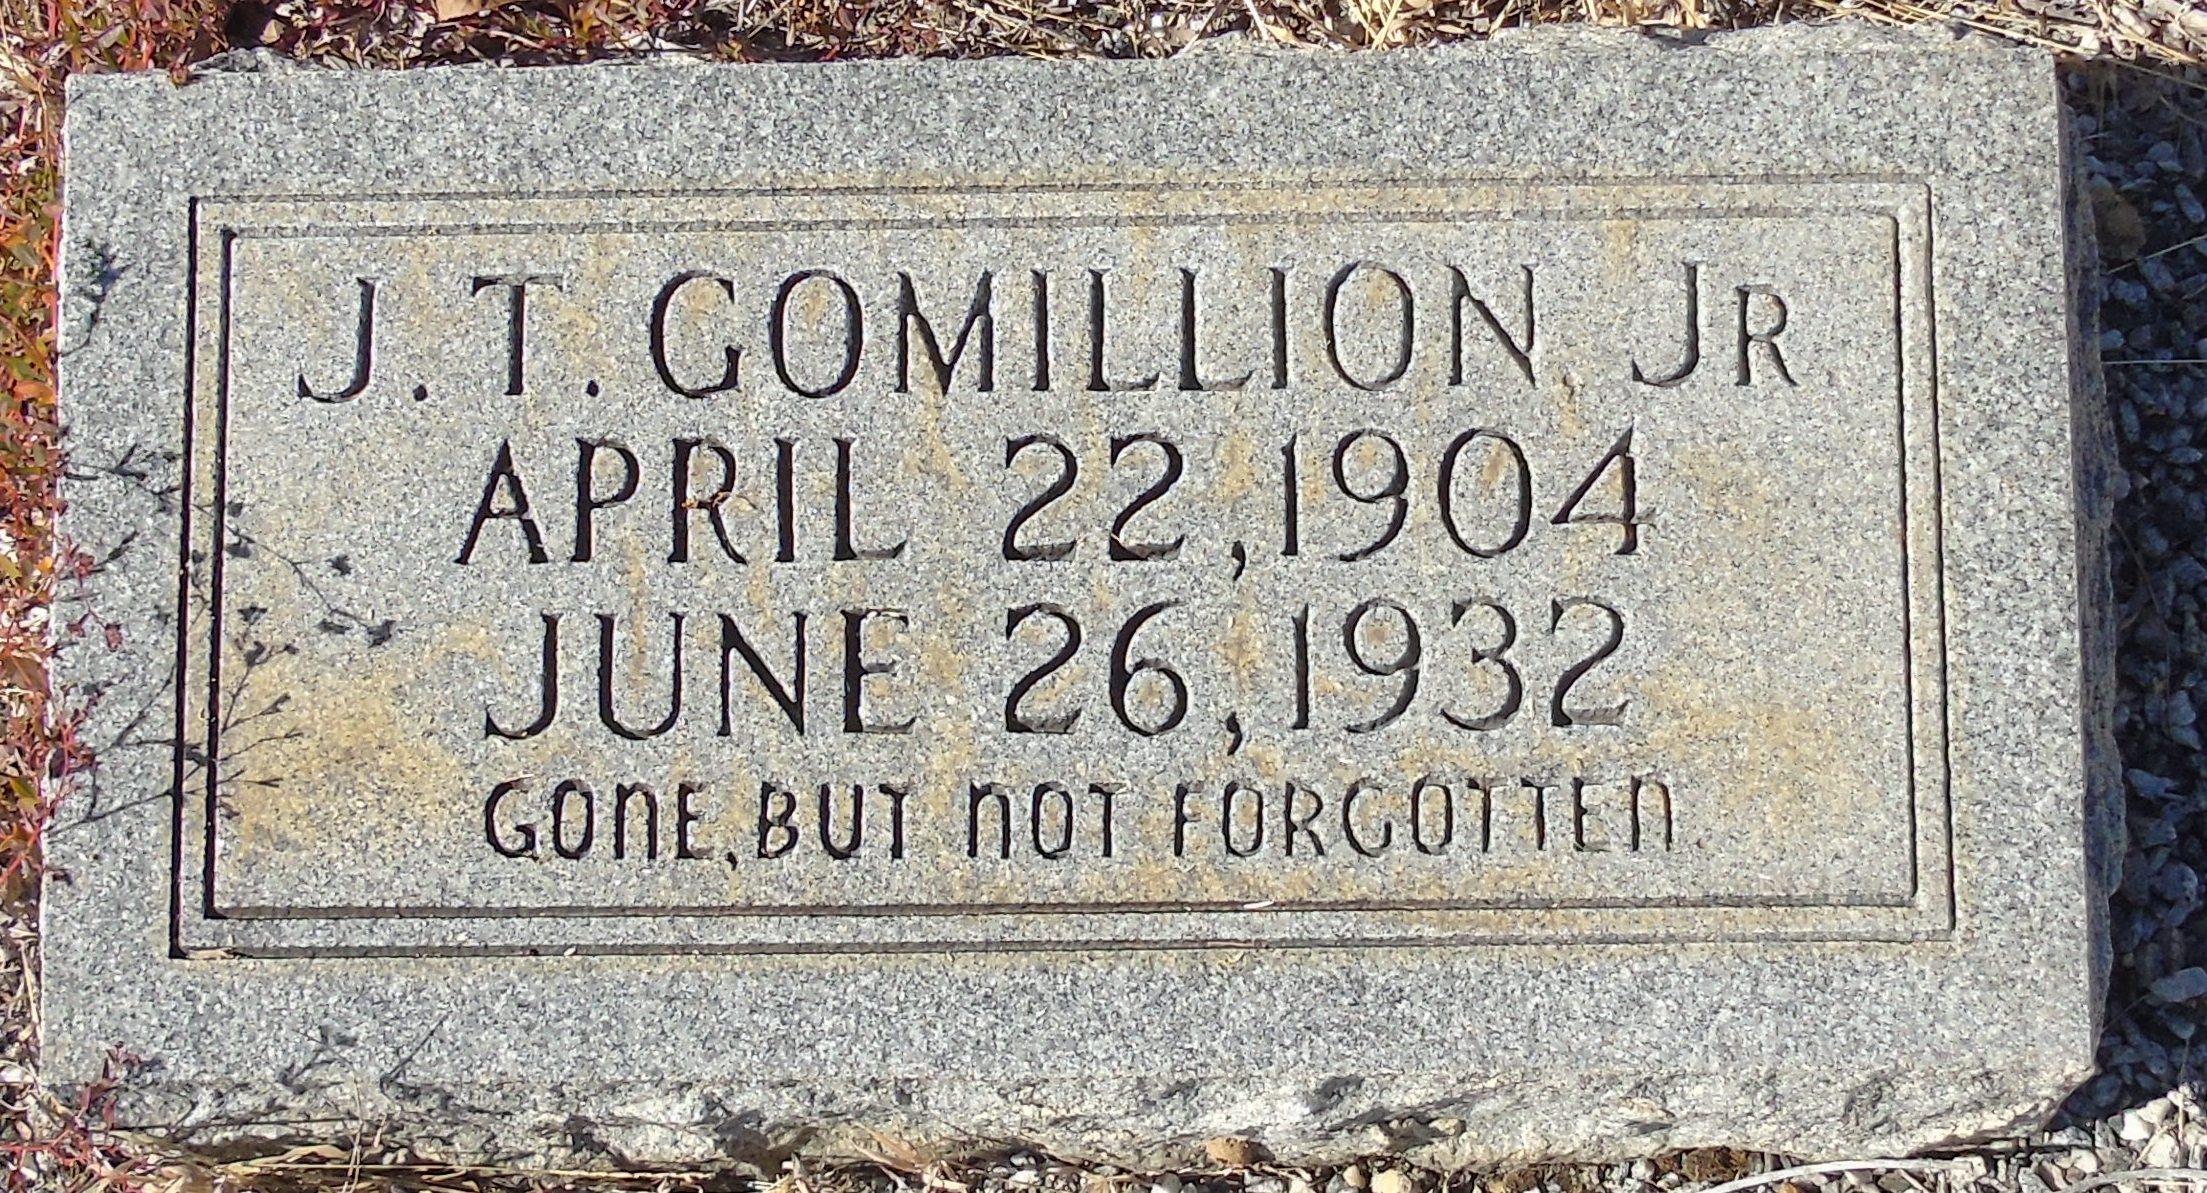 Deputy Sheriff J. T. Gomillion, Jr.   Covington County Sheriff's Office, Alabama